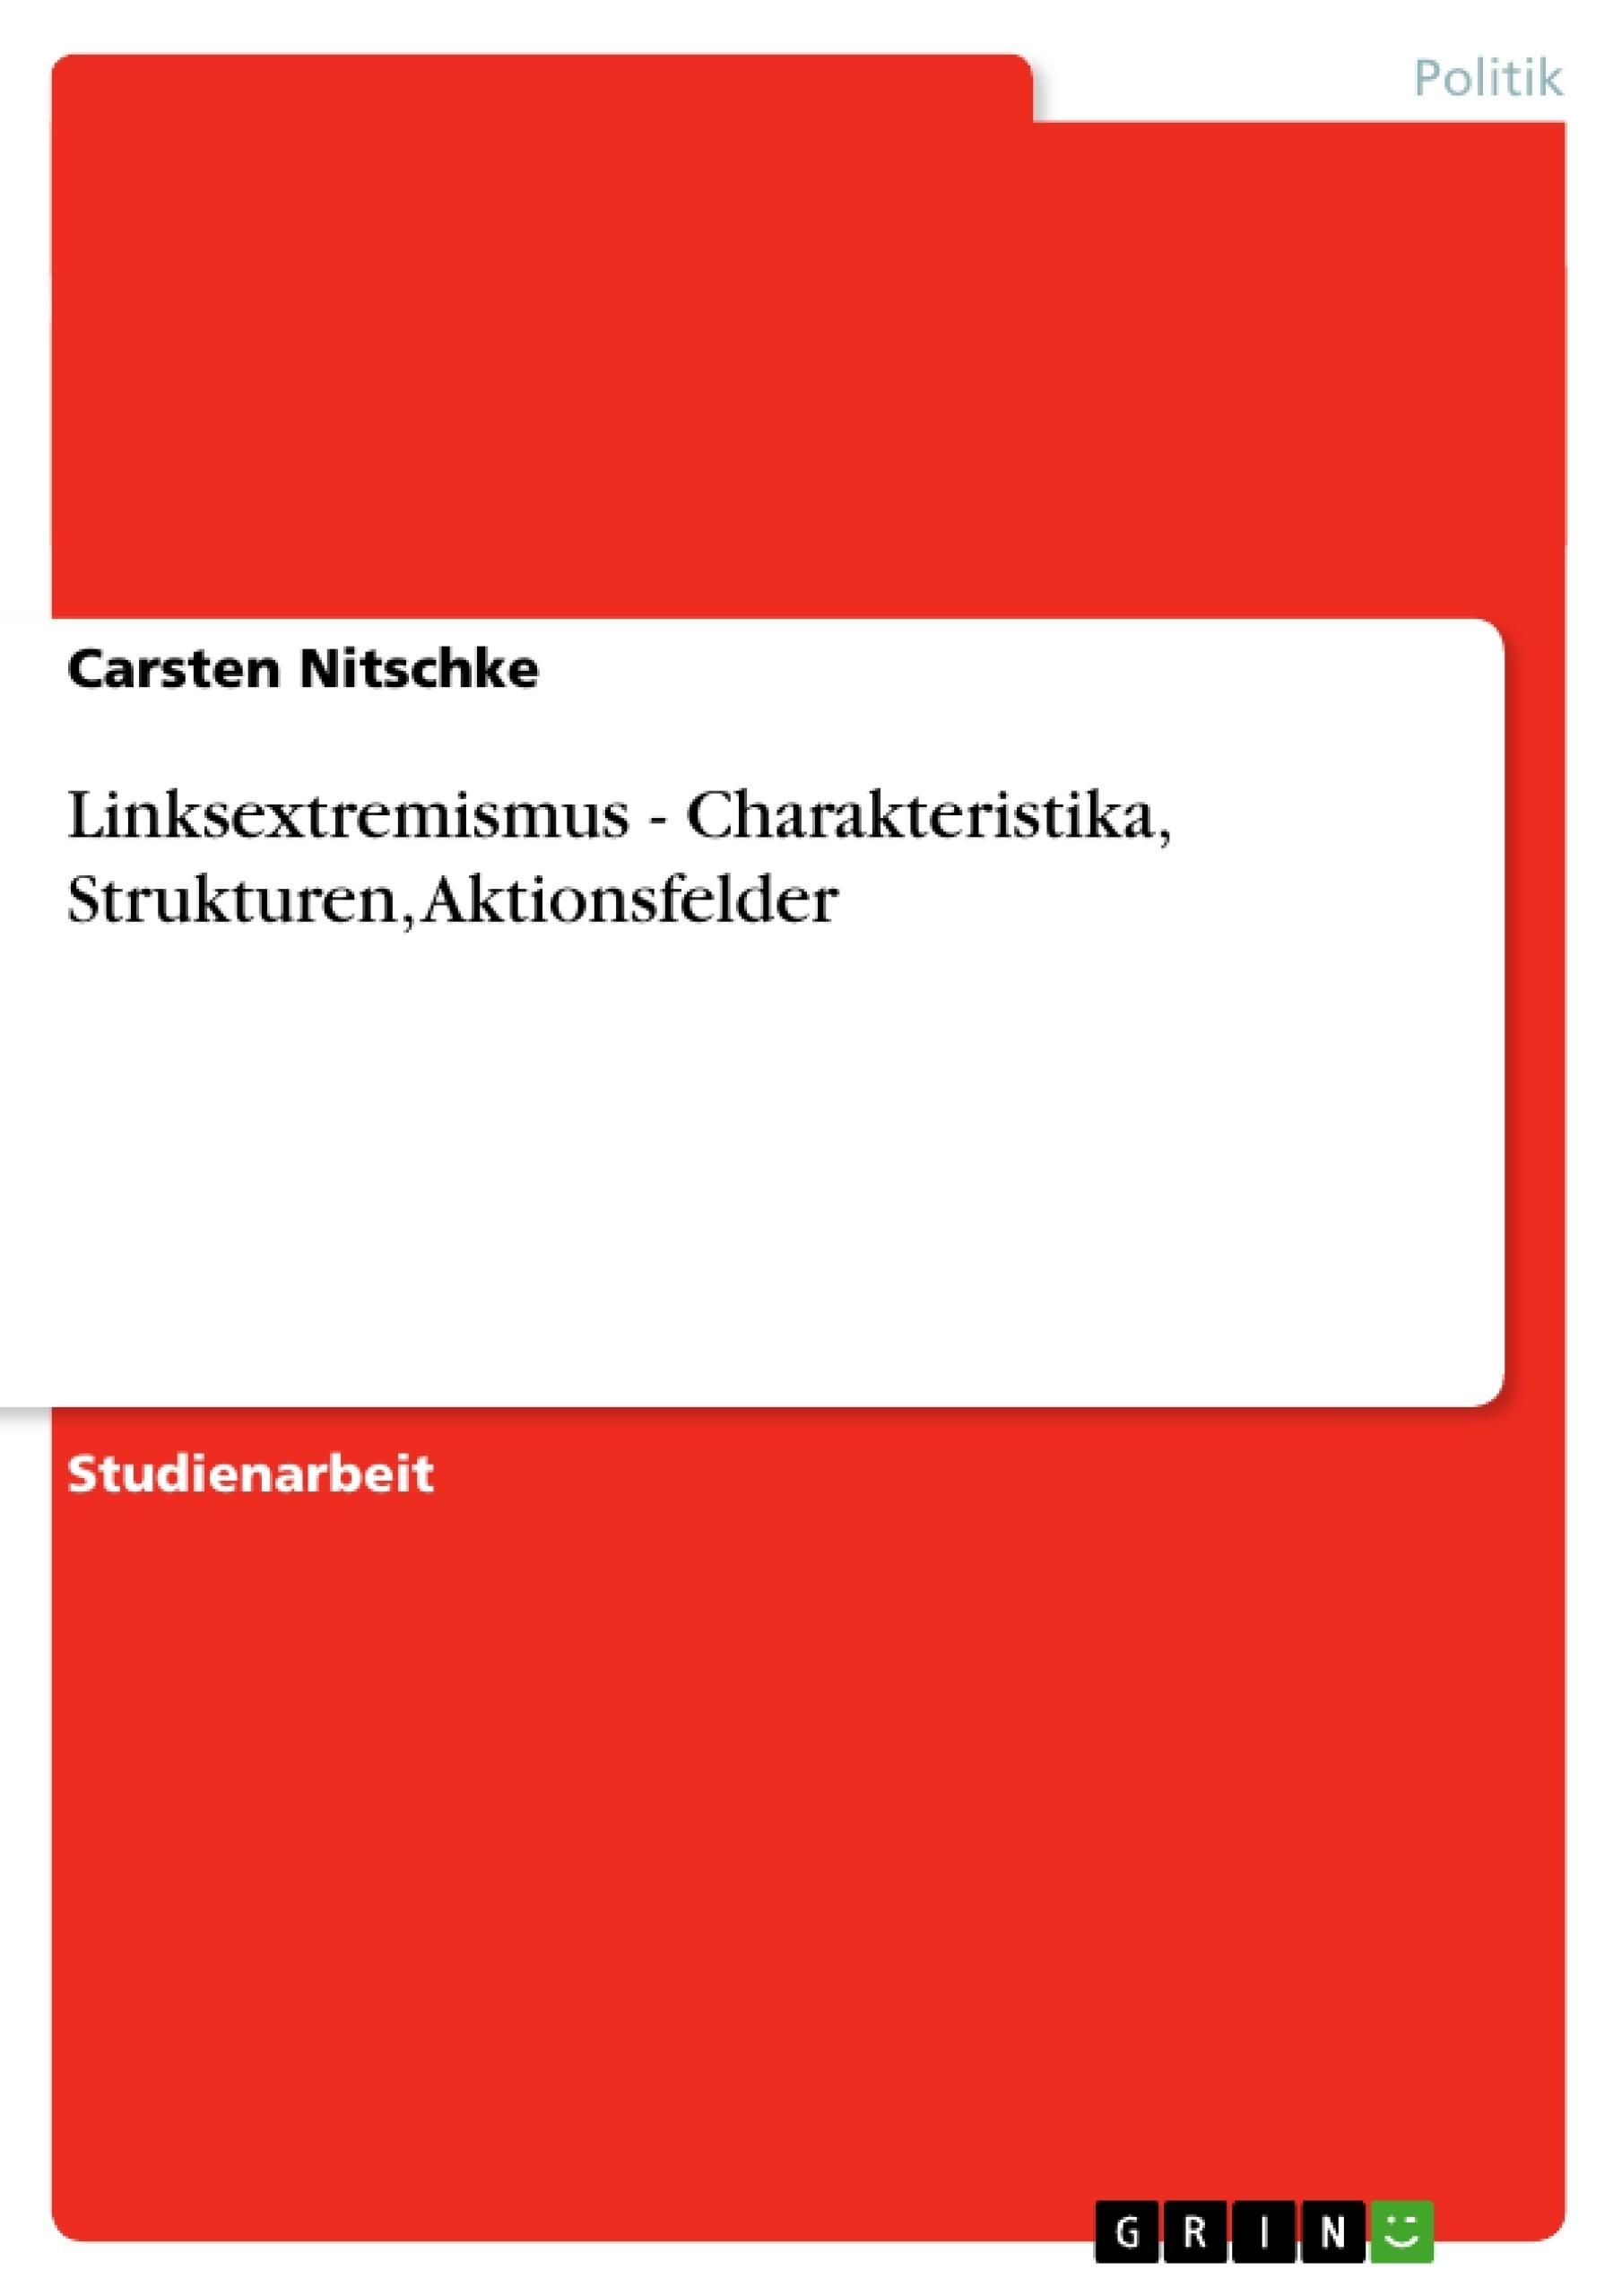 Titel: Linksextremismus - Charakteristika, Strukturen, Aktionsfelder